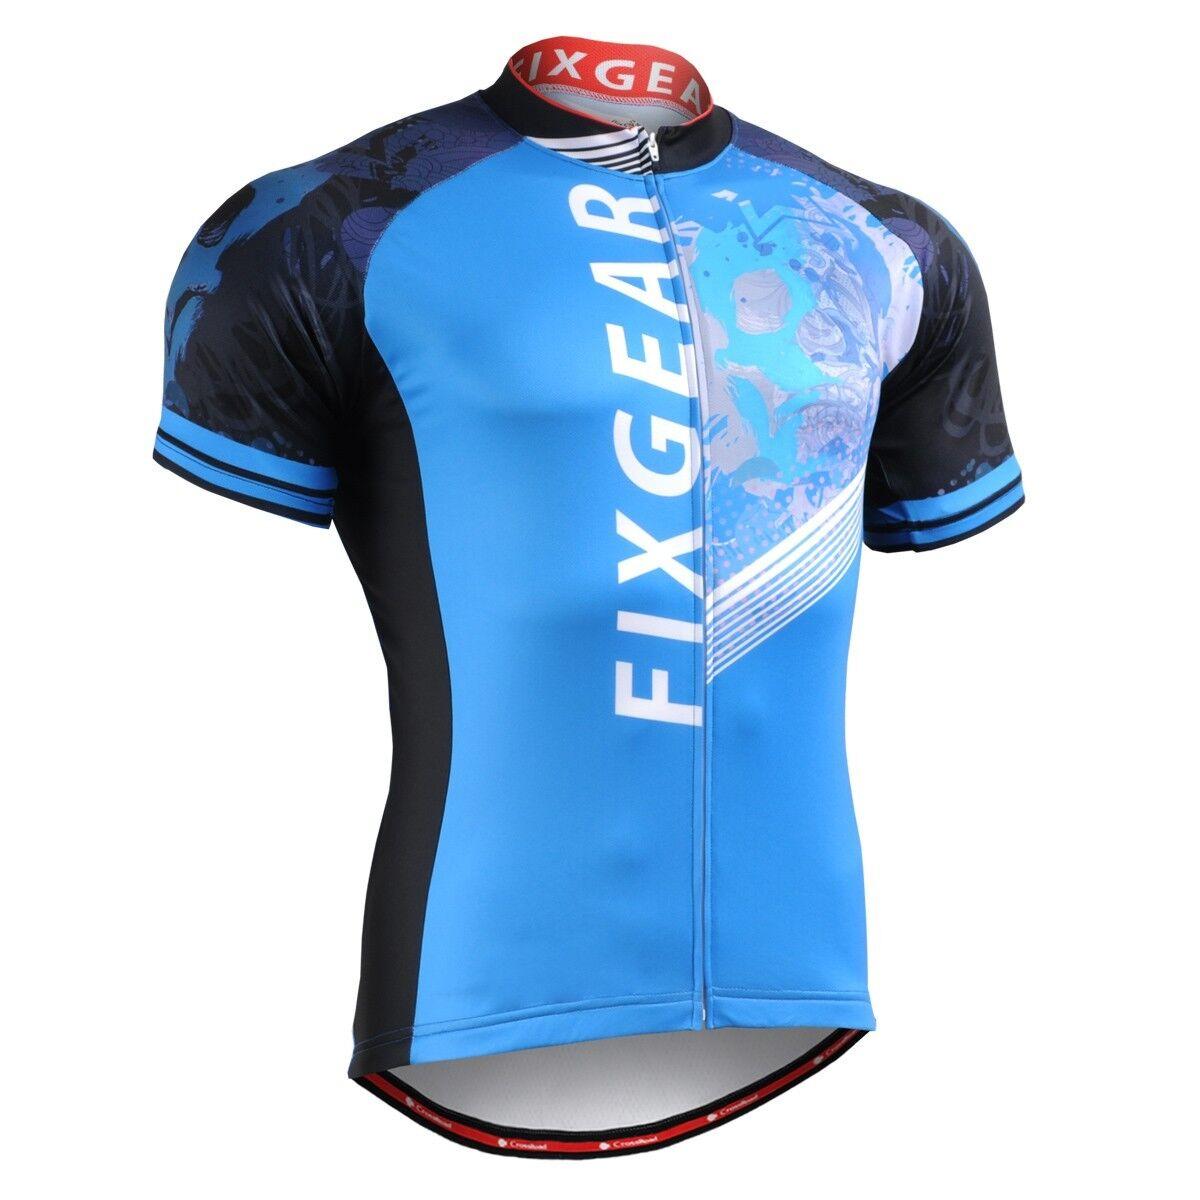 FIXGEAR CS-4602 Men's Short Sleeve Cycling Jersey Bicycle Apparel Roadbike MTB